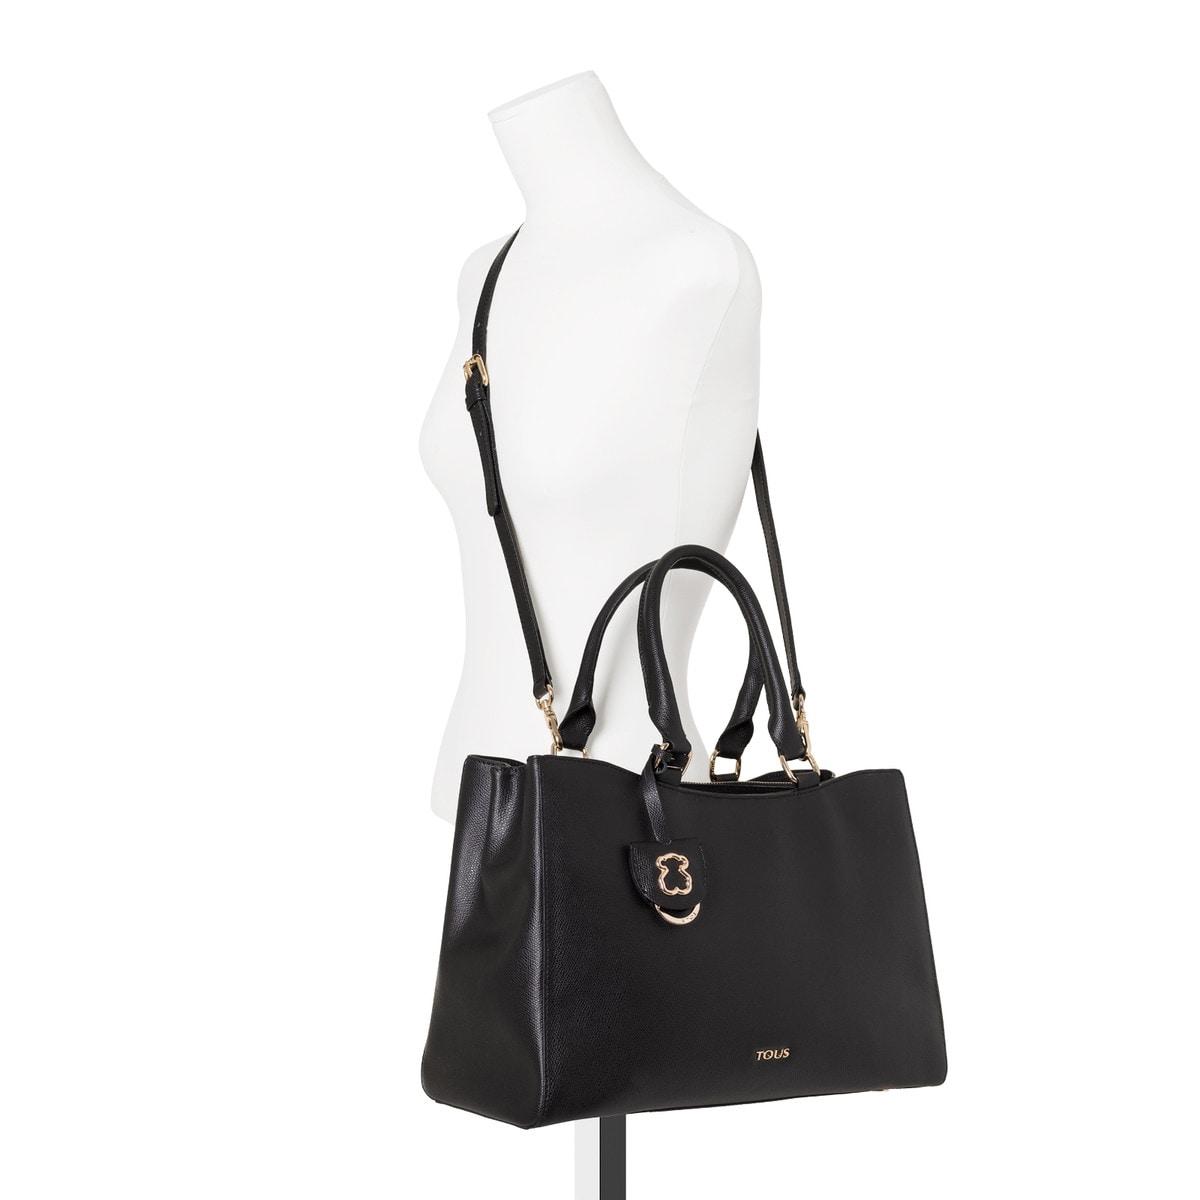 9f0057c70ab Μεσαίου μεγέθους τσάντα City Odalis από Δέρμα σε μαύρο χρώμα - Tous ...